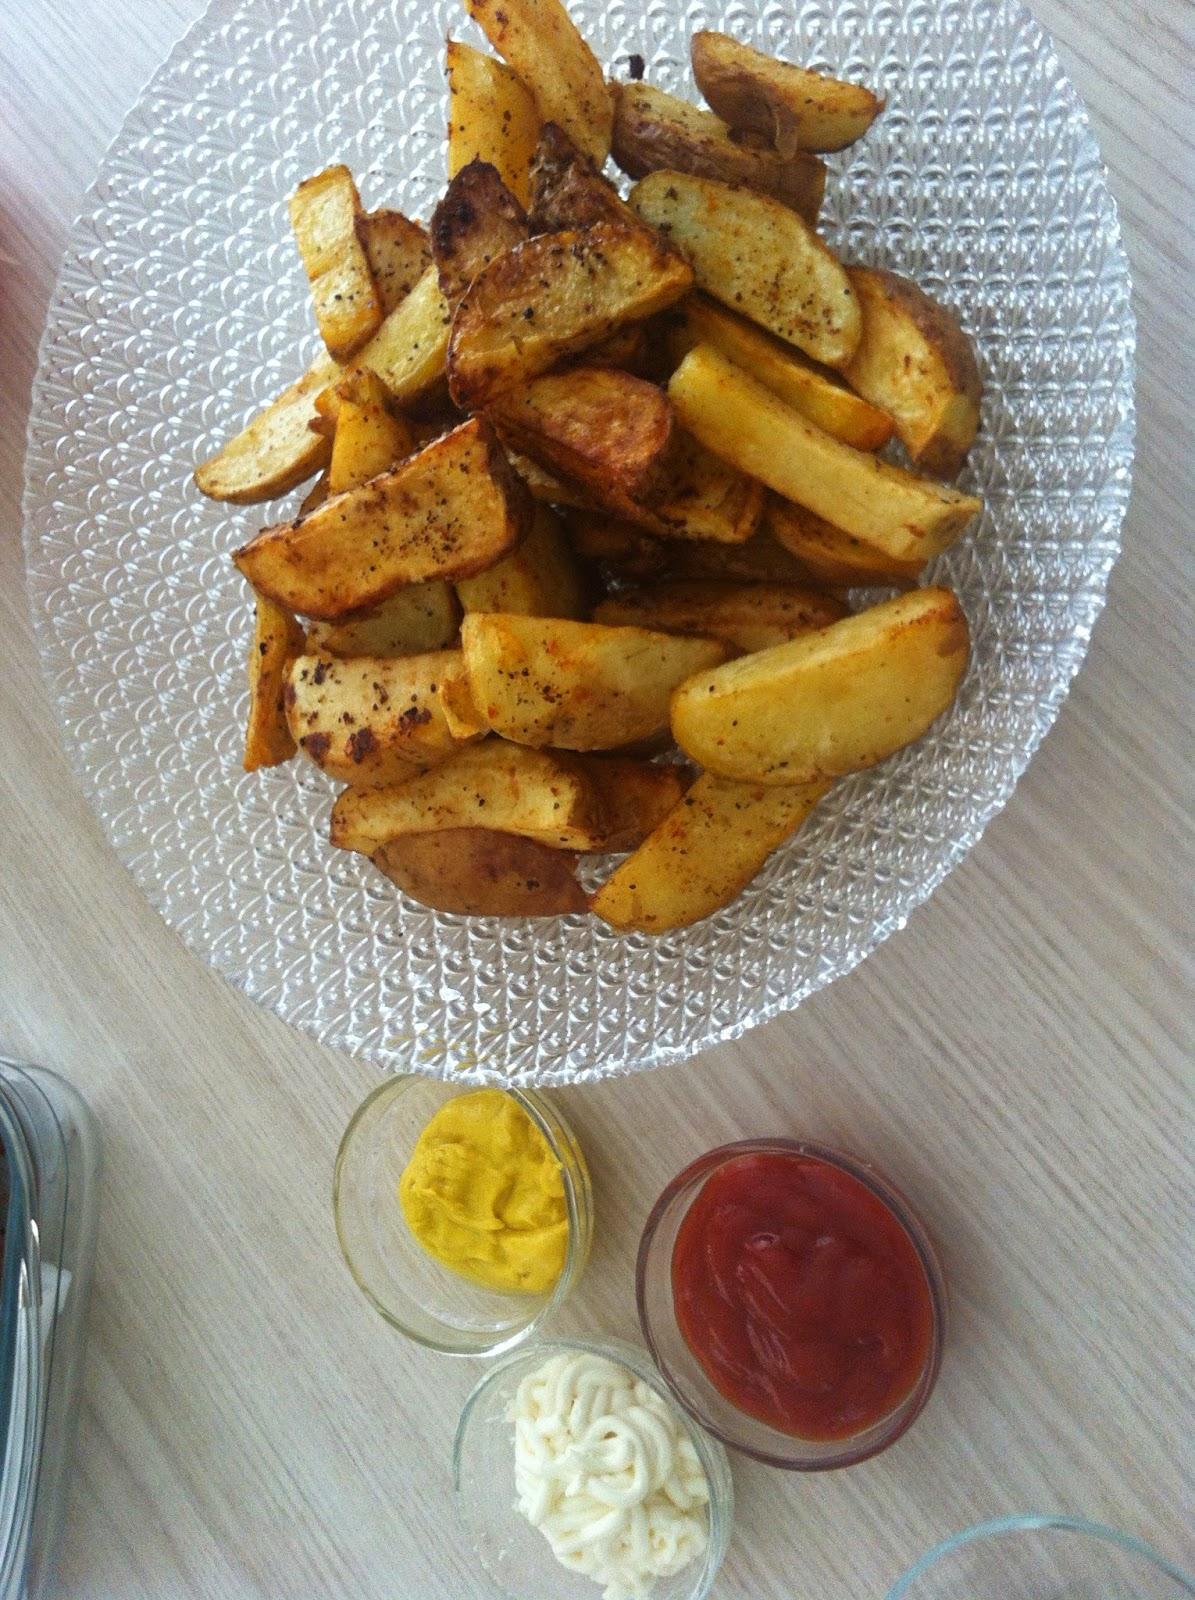 Fırında elma dilimi patates yapılışı